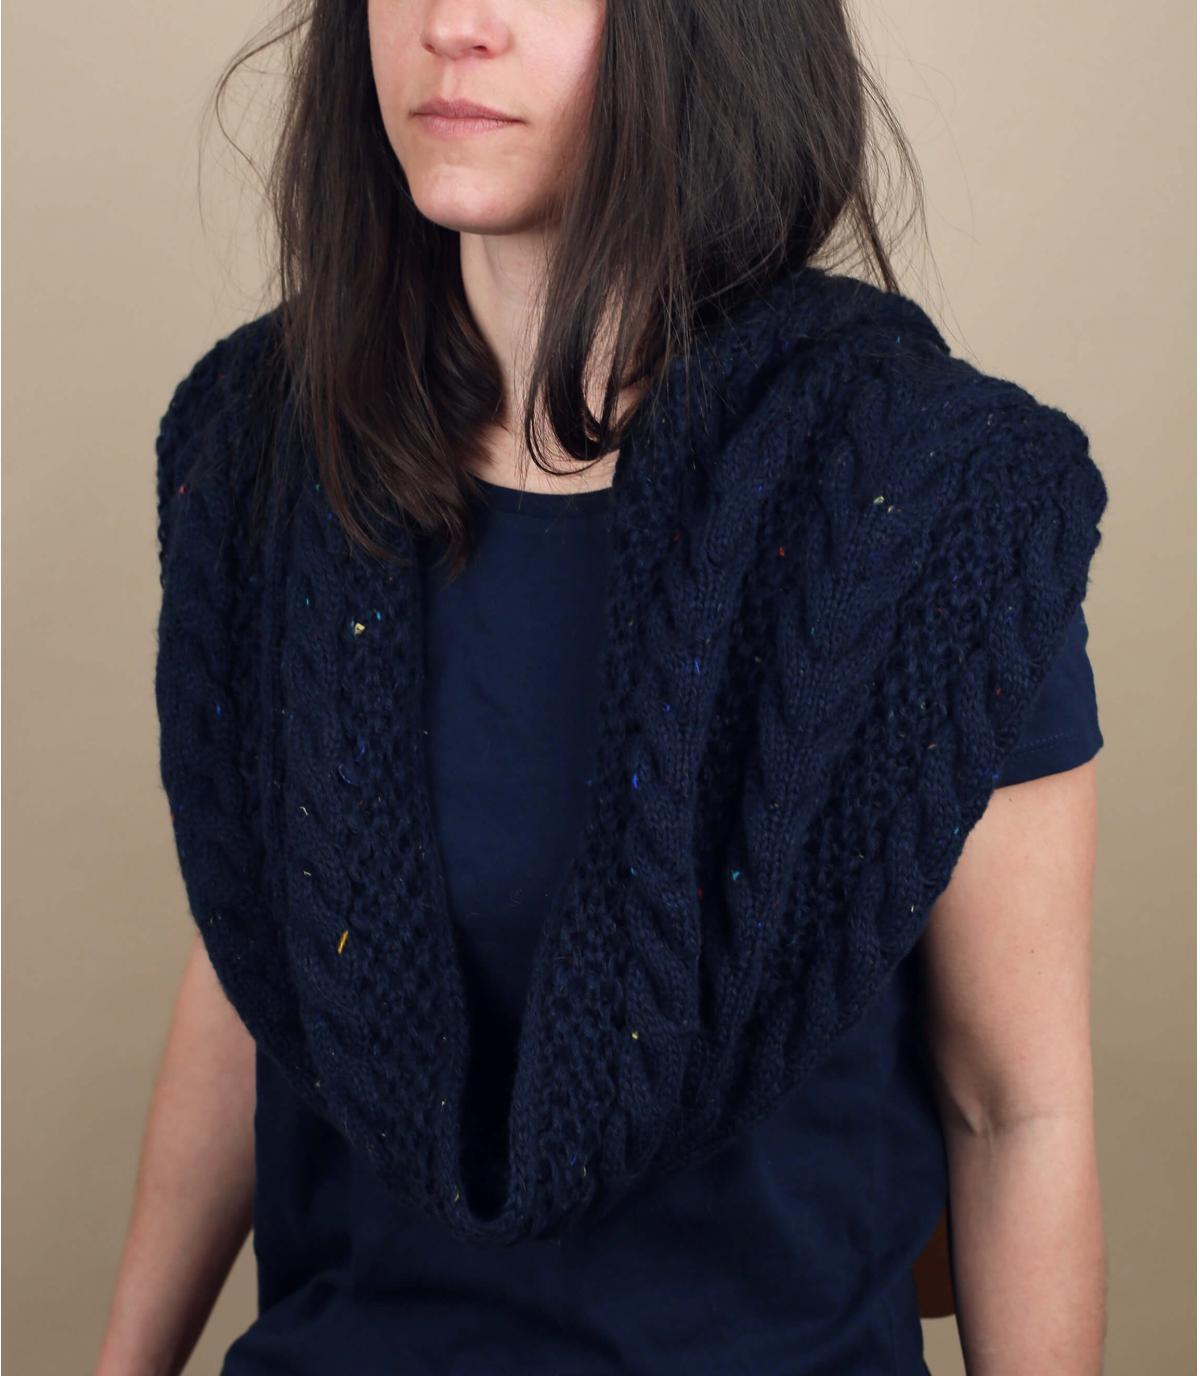 gedraaide blauwe sjaal